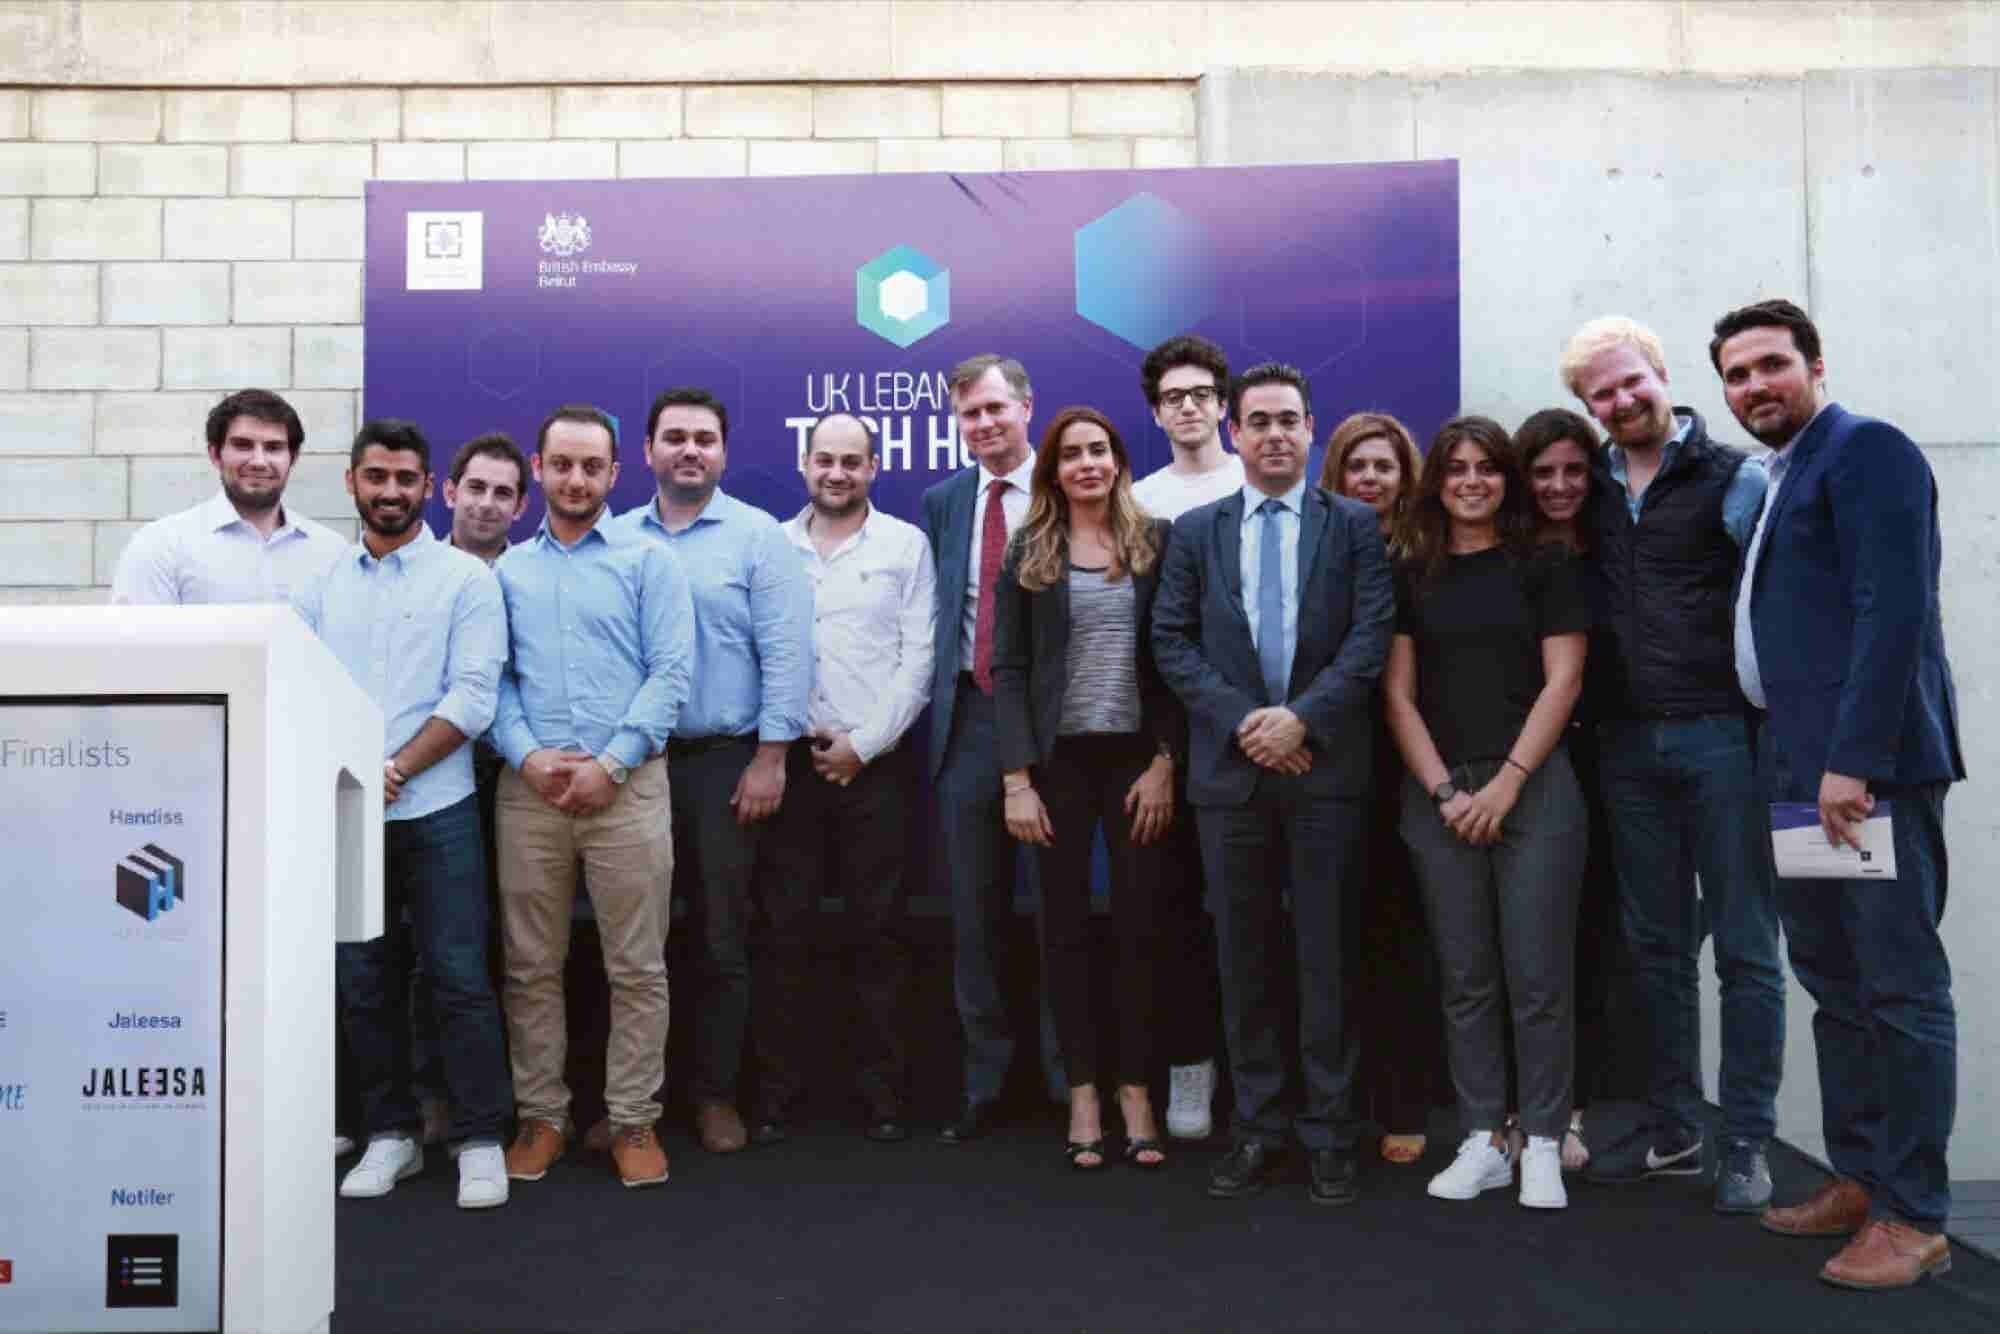 UK Lebanon Tech Hub Gets US$3.2 Million Boost To Accelerate Lebanese Tech Startups